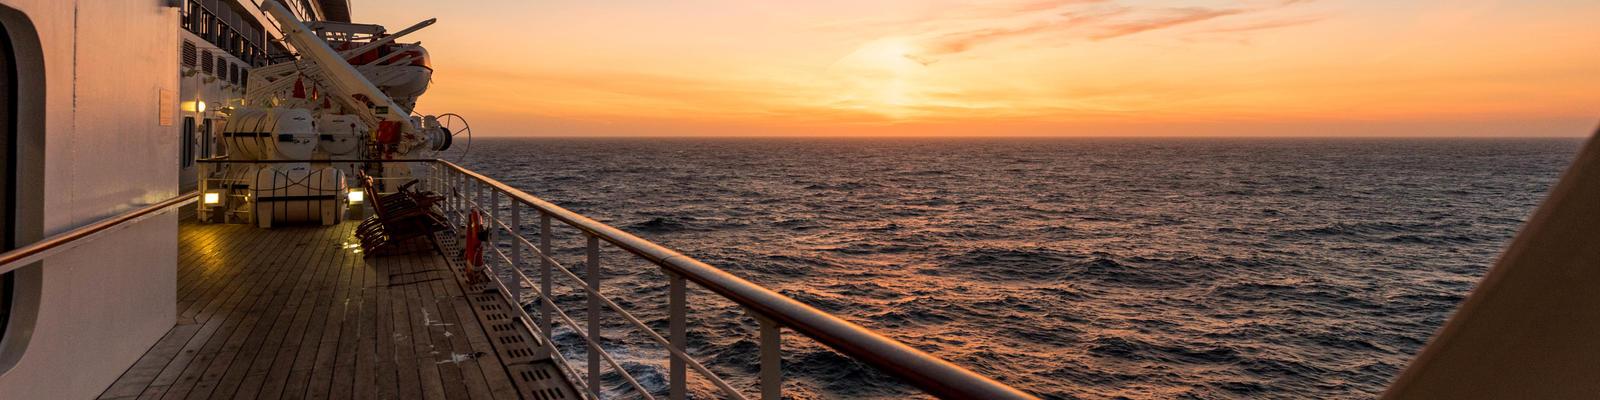 Transatlantic crossing on Queen Mary 2 (Photo: Cruise Critic)